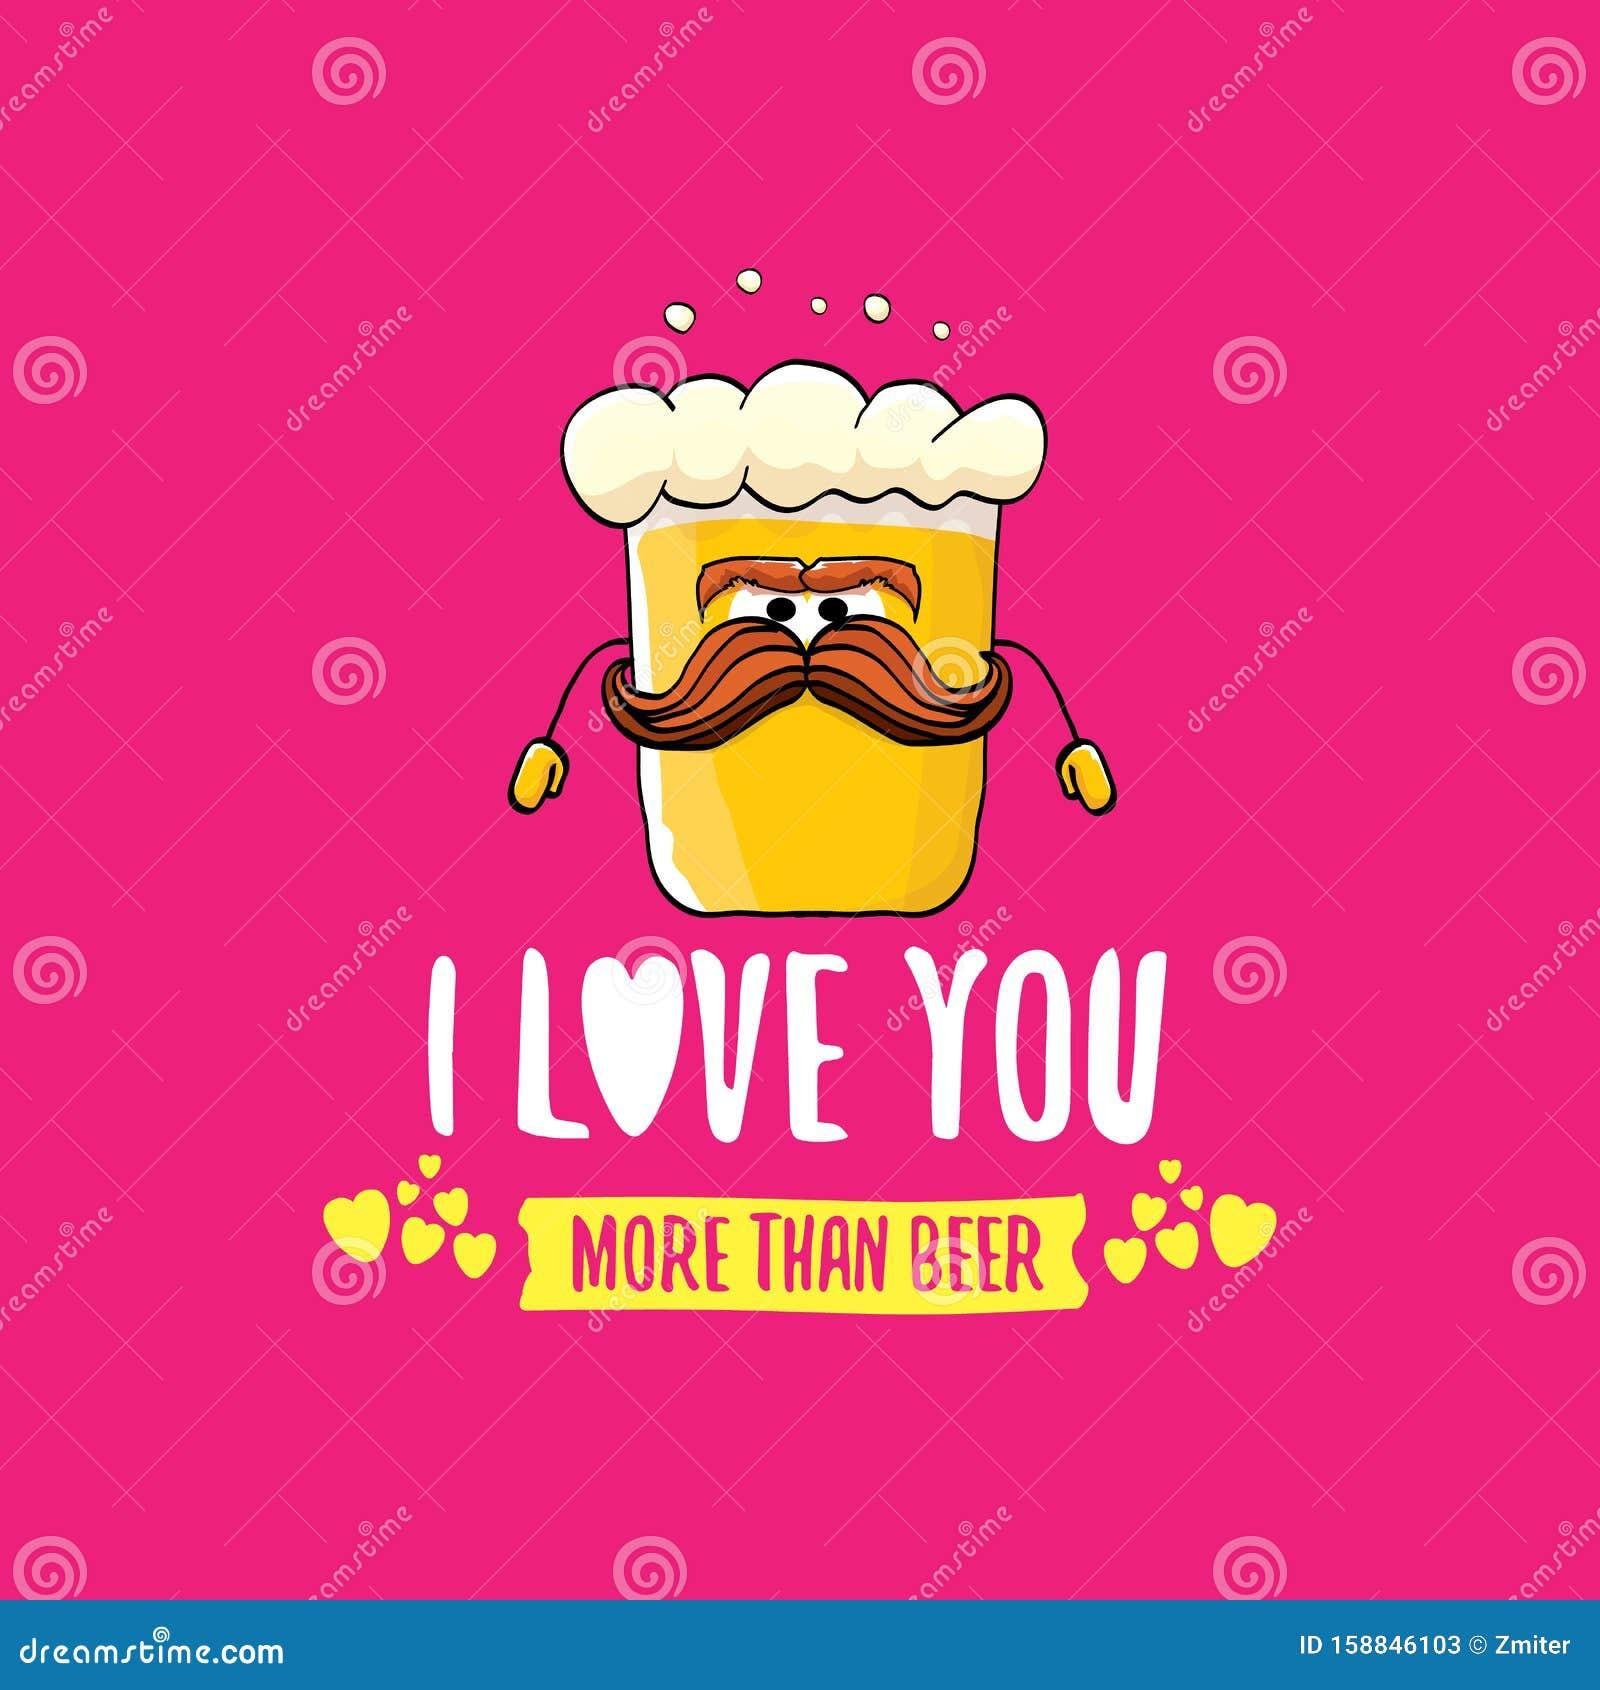 695+ Beer Bottle Svg Love by CalaDesign